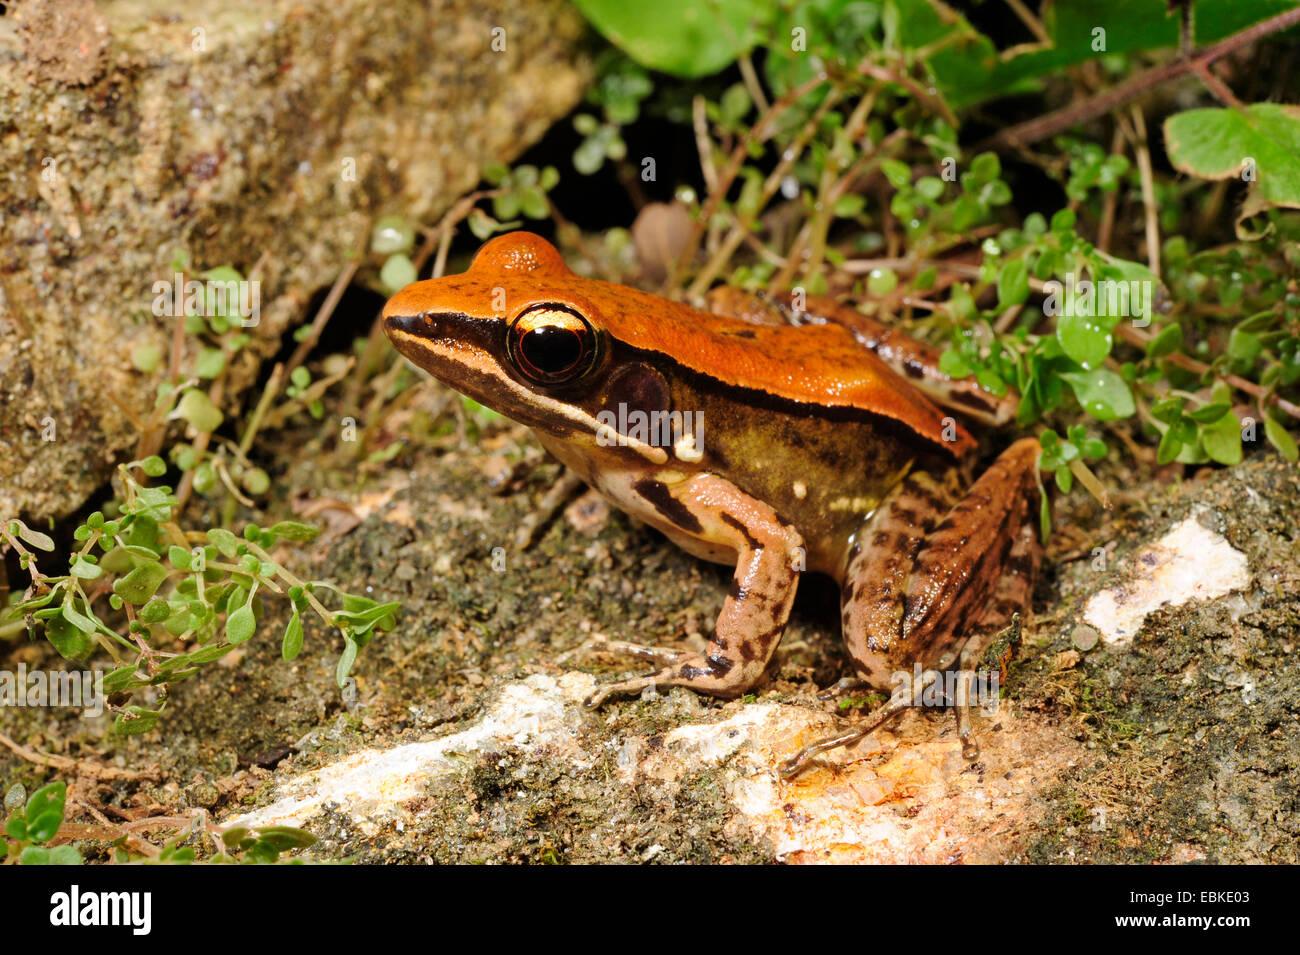 tropical frog species (Hylarana spec., Rana subgen. Hylarana), sitting on the forest ground, Sri Lanka, Sinharaja - Stock Image